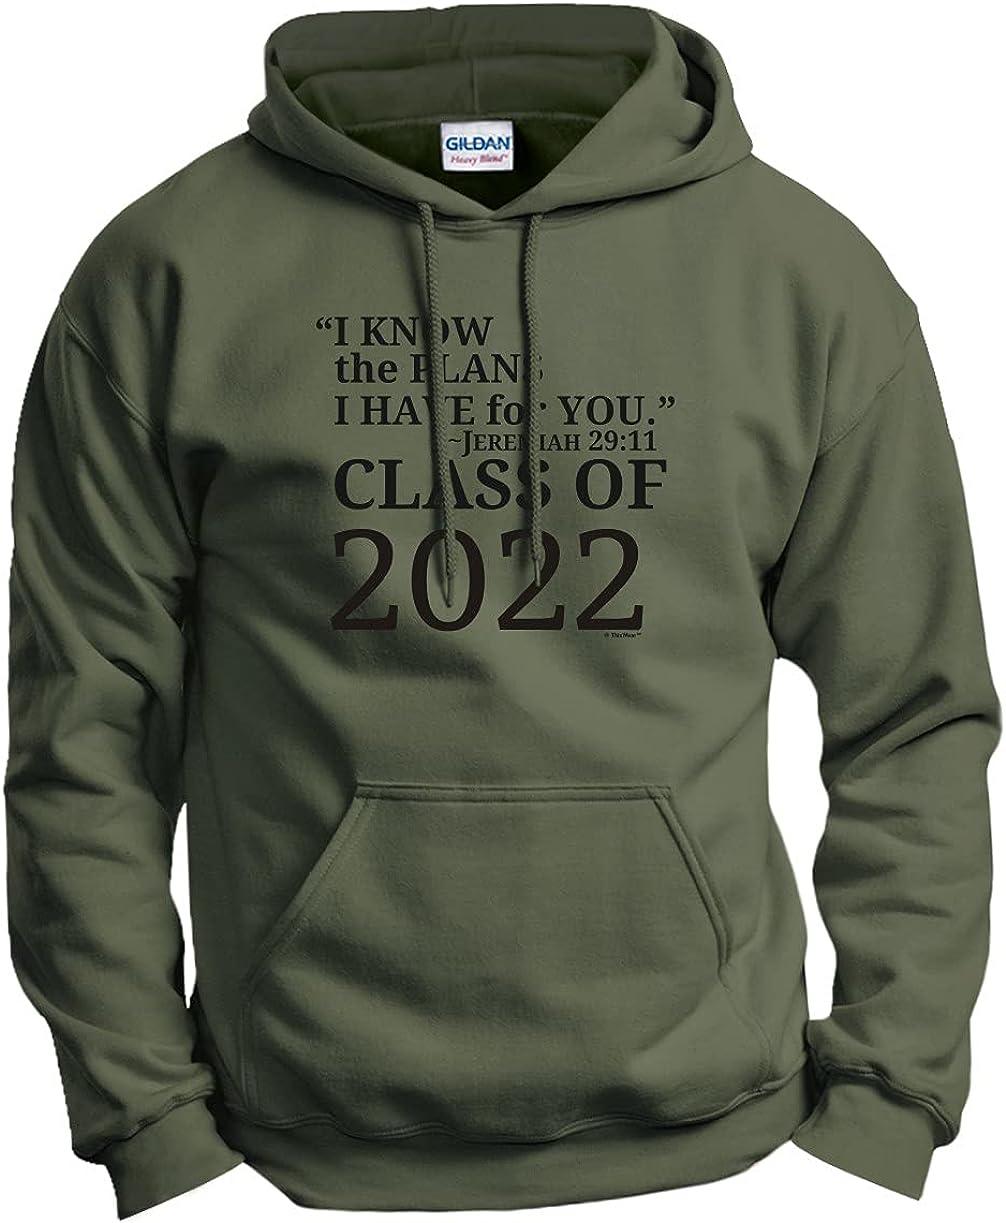 Christian Graduation Gift Jeremiah 29:11 Very Long Beach Mall popular Hoodie 2022 Sweat Class